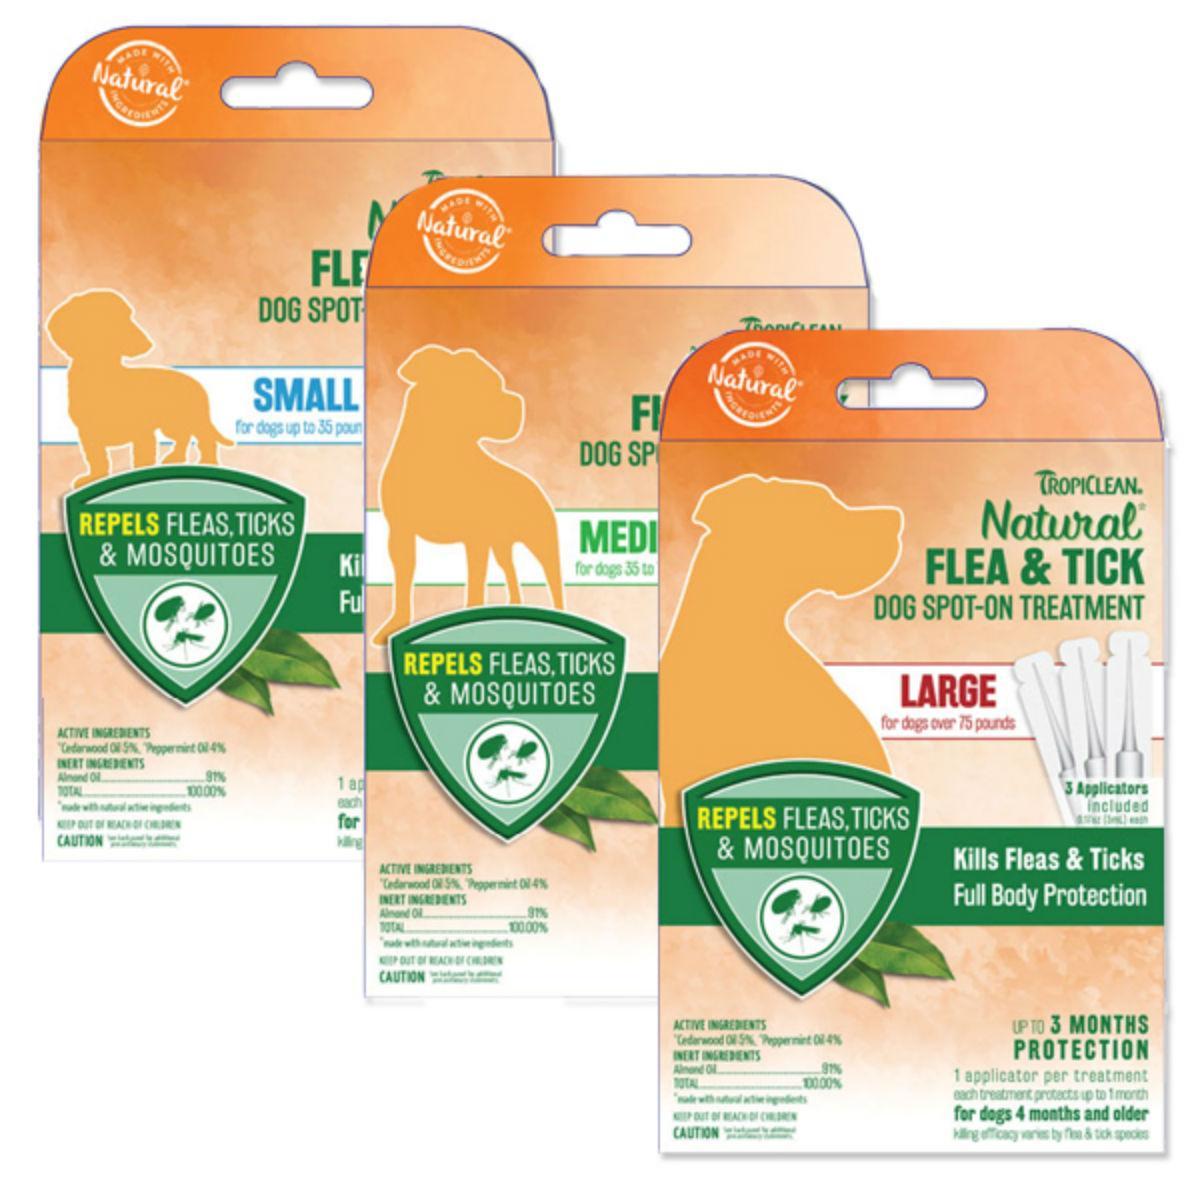 TropiClean Natural Flea & Tick Spot-On Dog Treatment